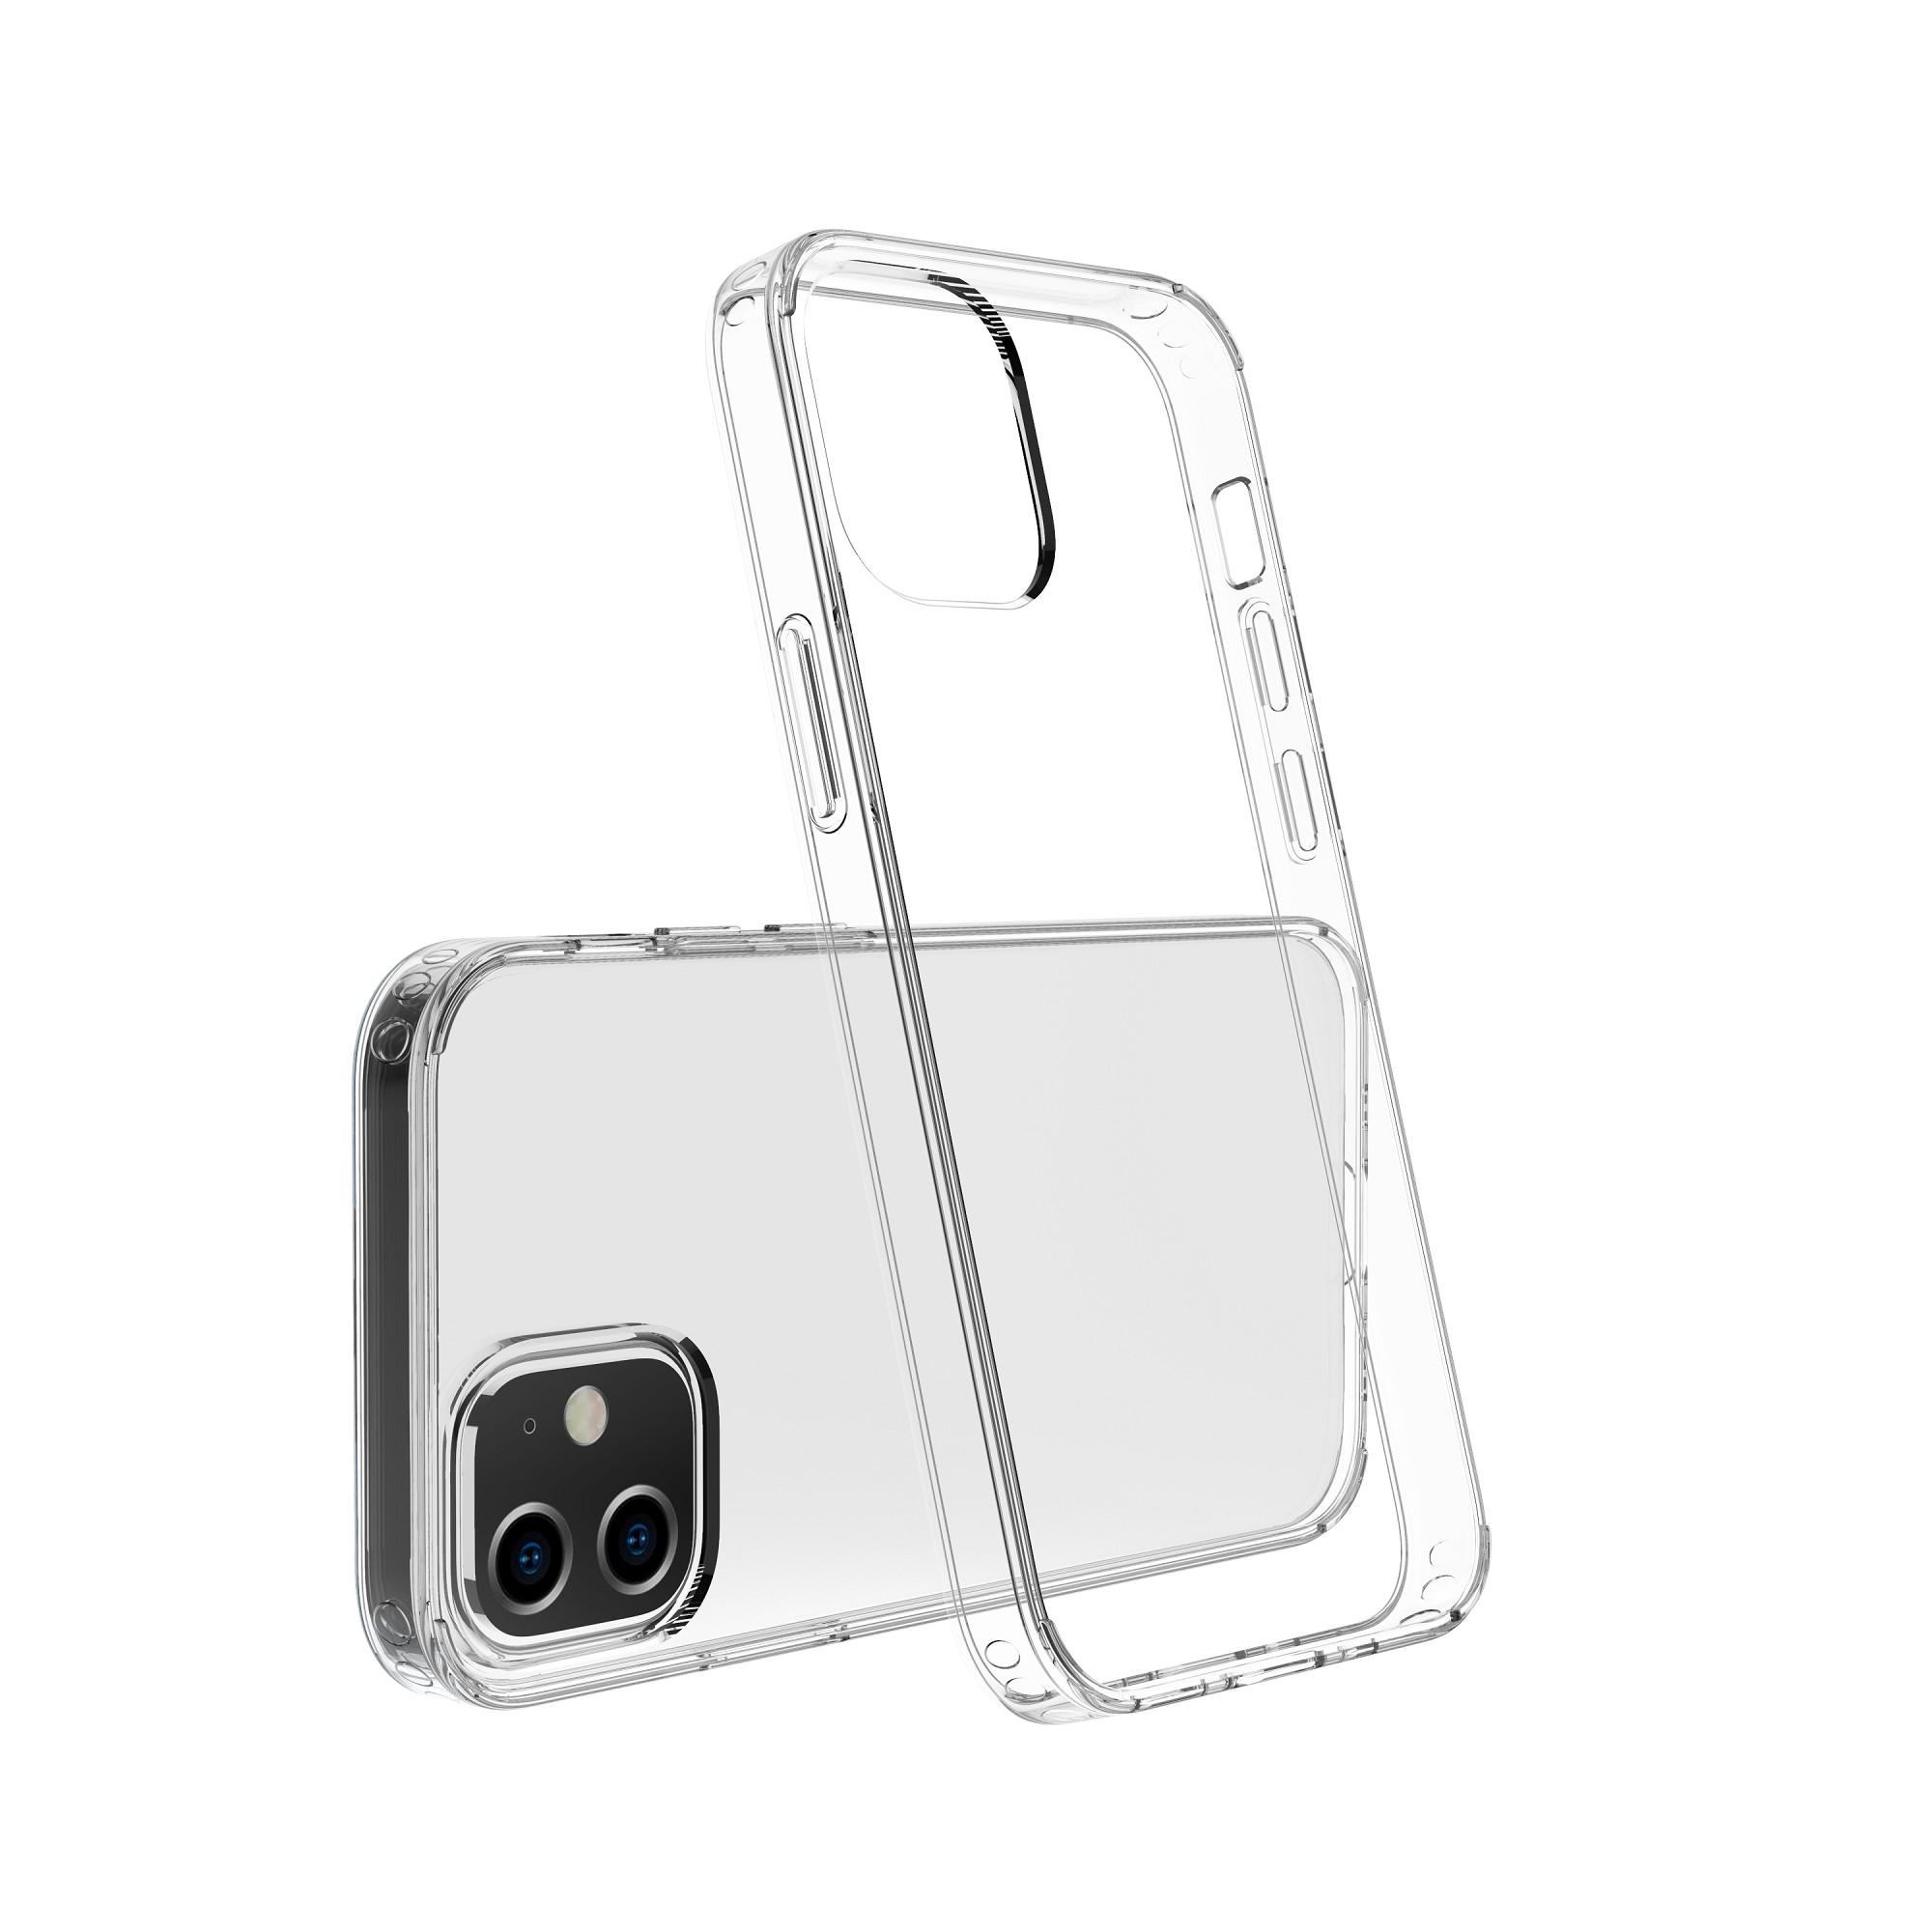 Capac protectie spate cellara colectia crystal pentru iphone 12 mini - transparent